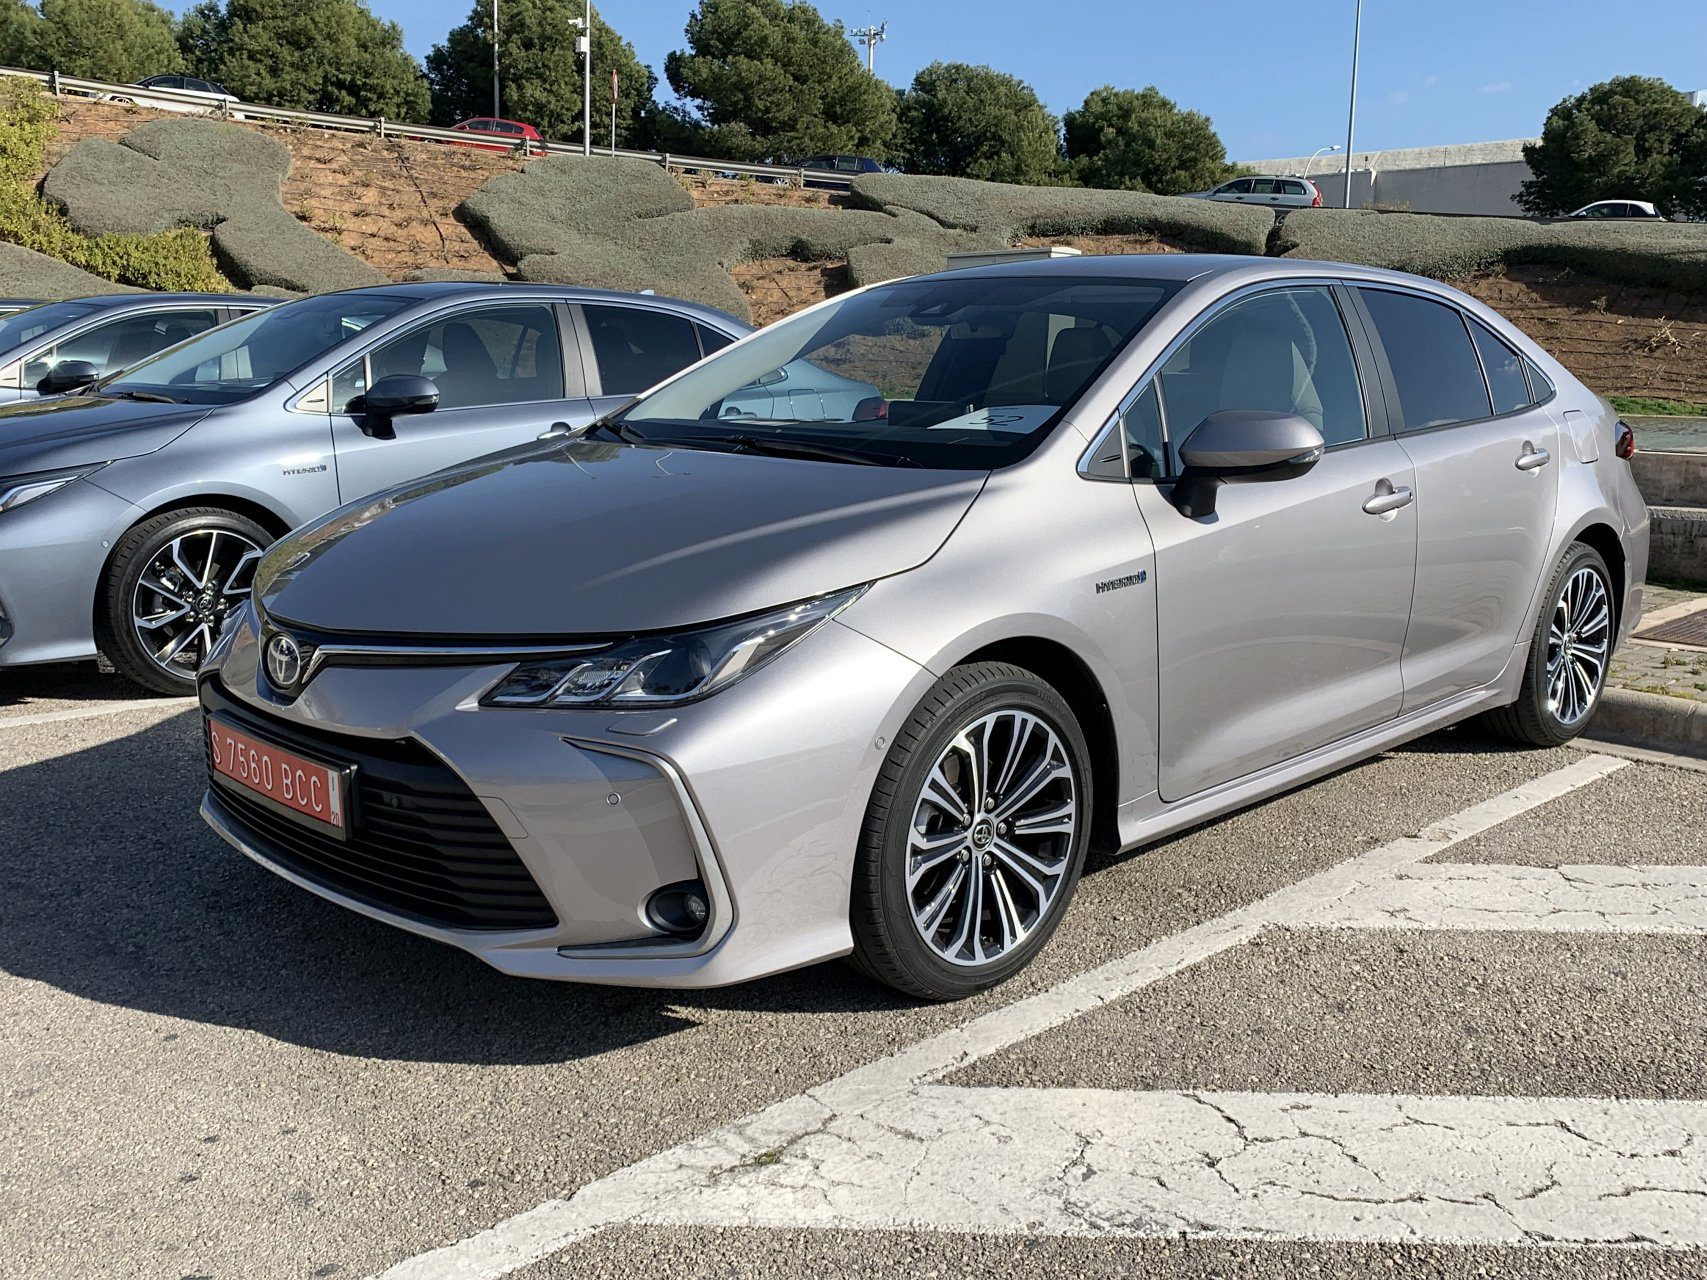 Toyota Corolla седан фото спереди